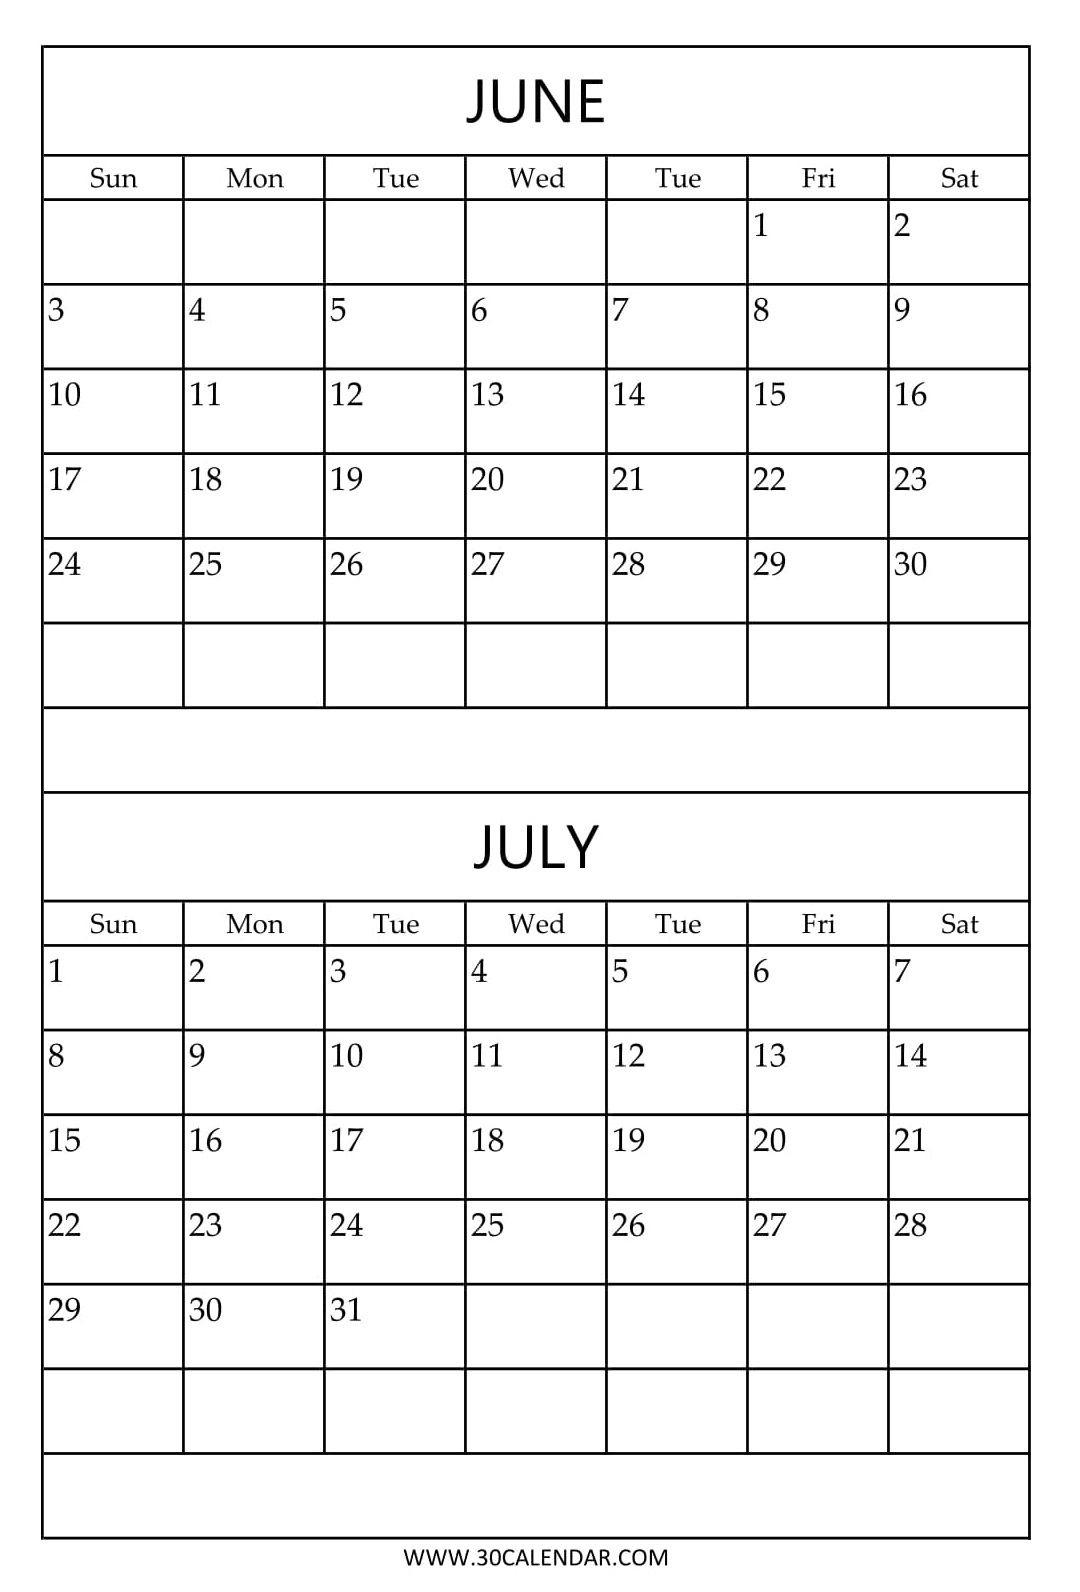 Free Printable June July Calendar Template | 2018 Calendar  June And July Calendar Printable